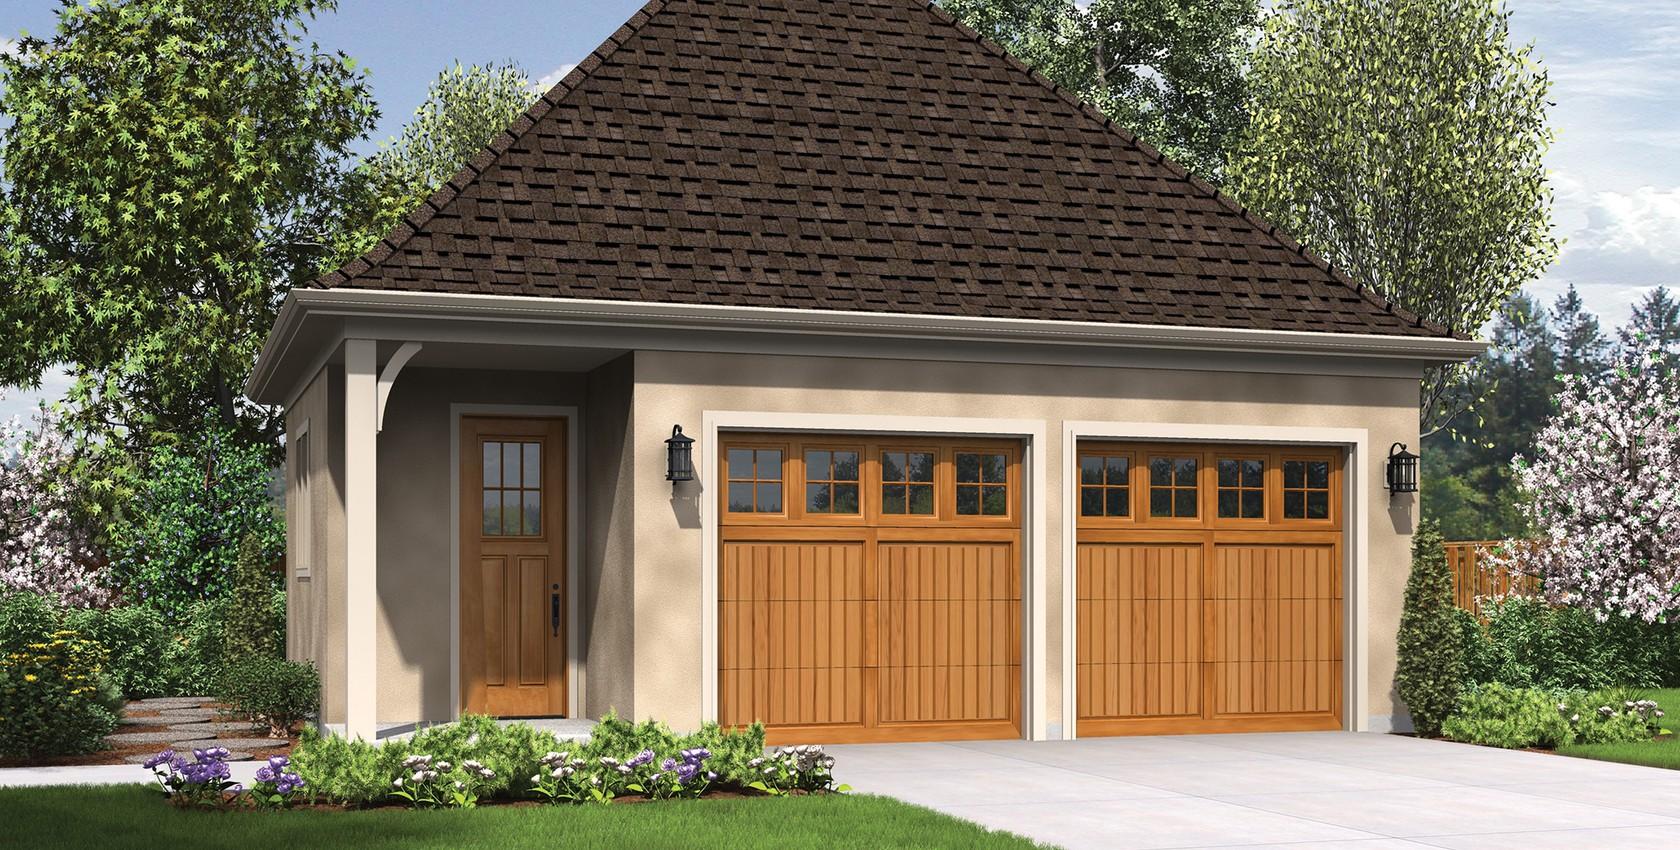 Mascord house plan 5032 the monaco - Full verandah house plans the functional extra space ...